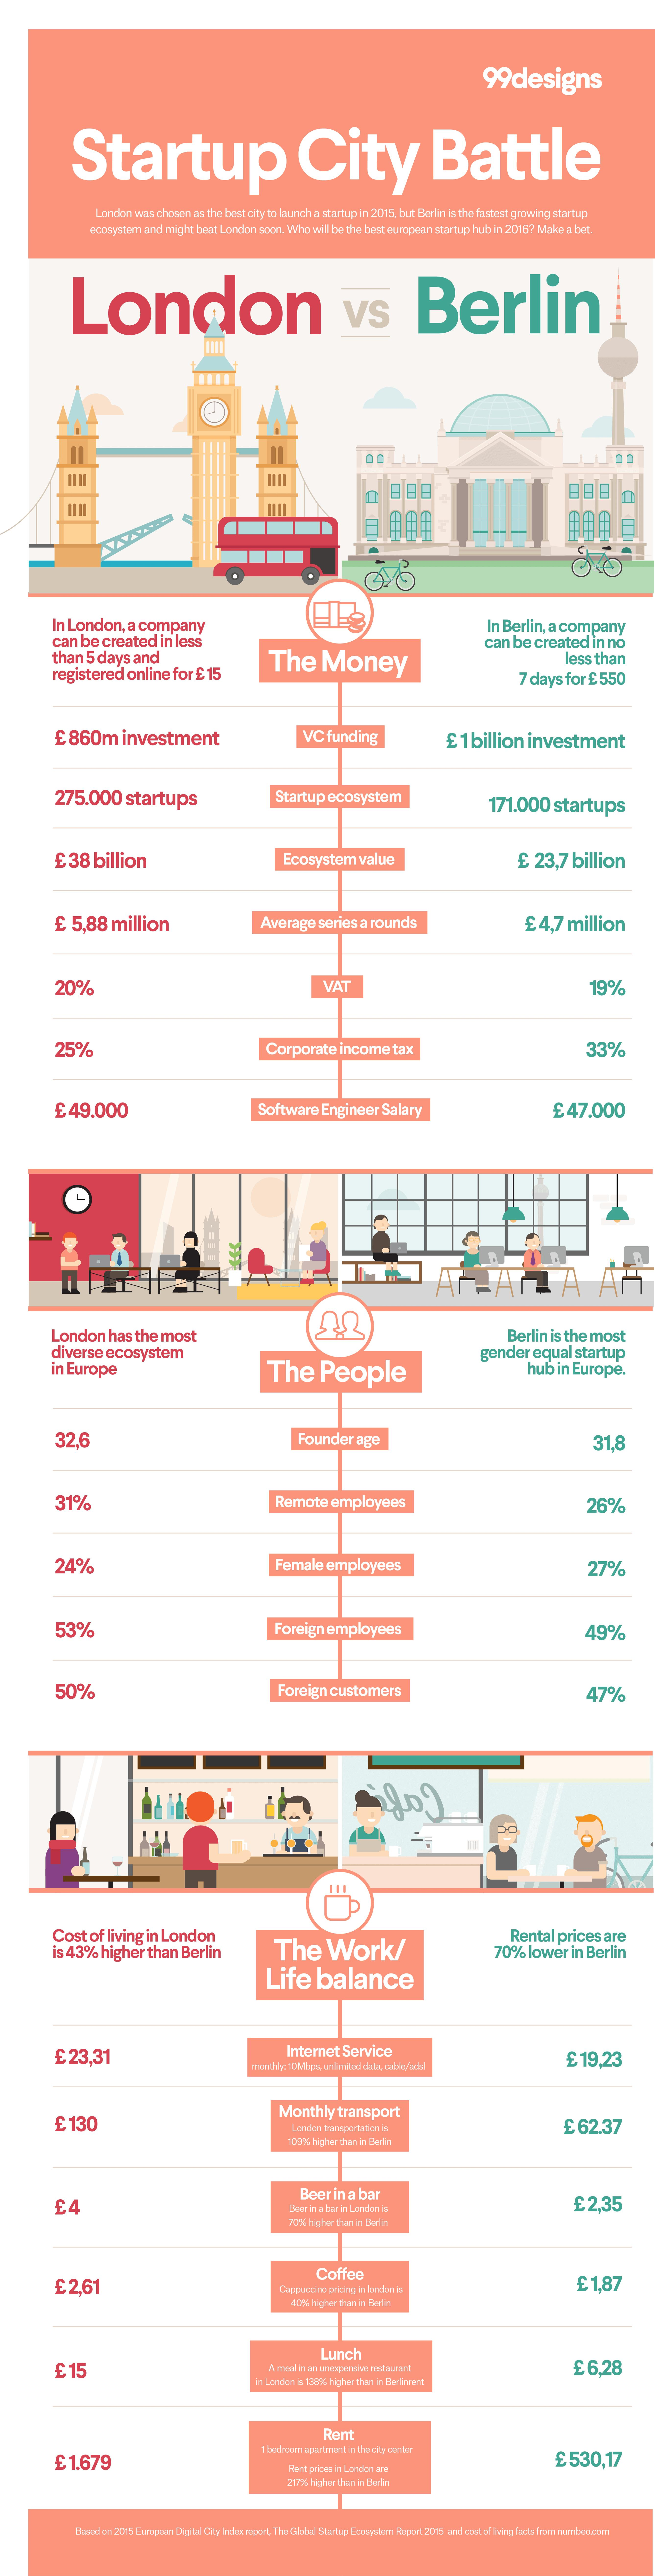 Startup City Battle London vs. Berlin